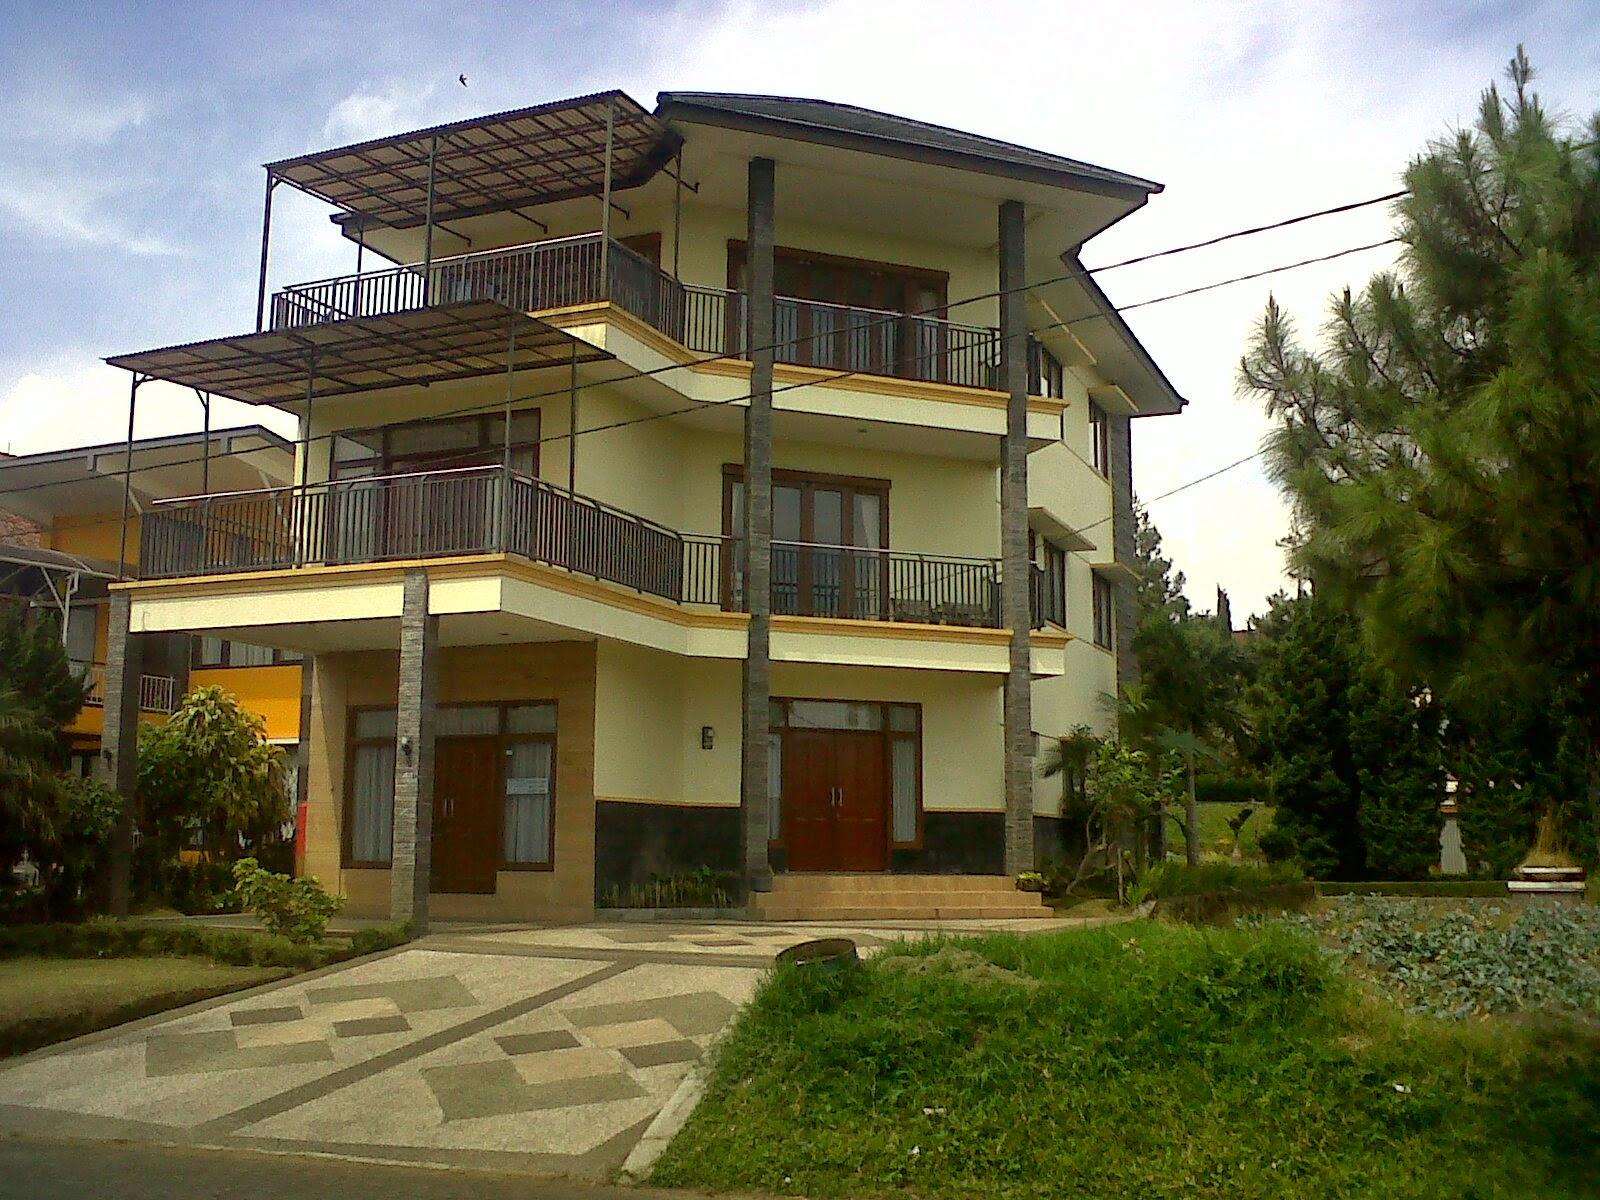 http://vilaistanabungavilage.blogspot.com/2014/12/kemudahan-sewa-villa-istana-bunga.html